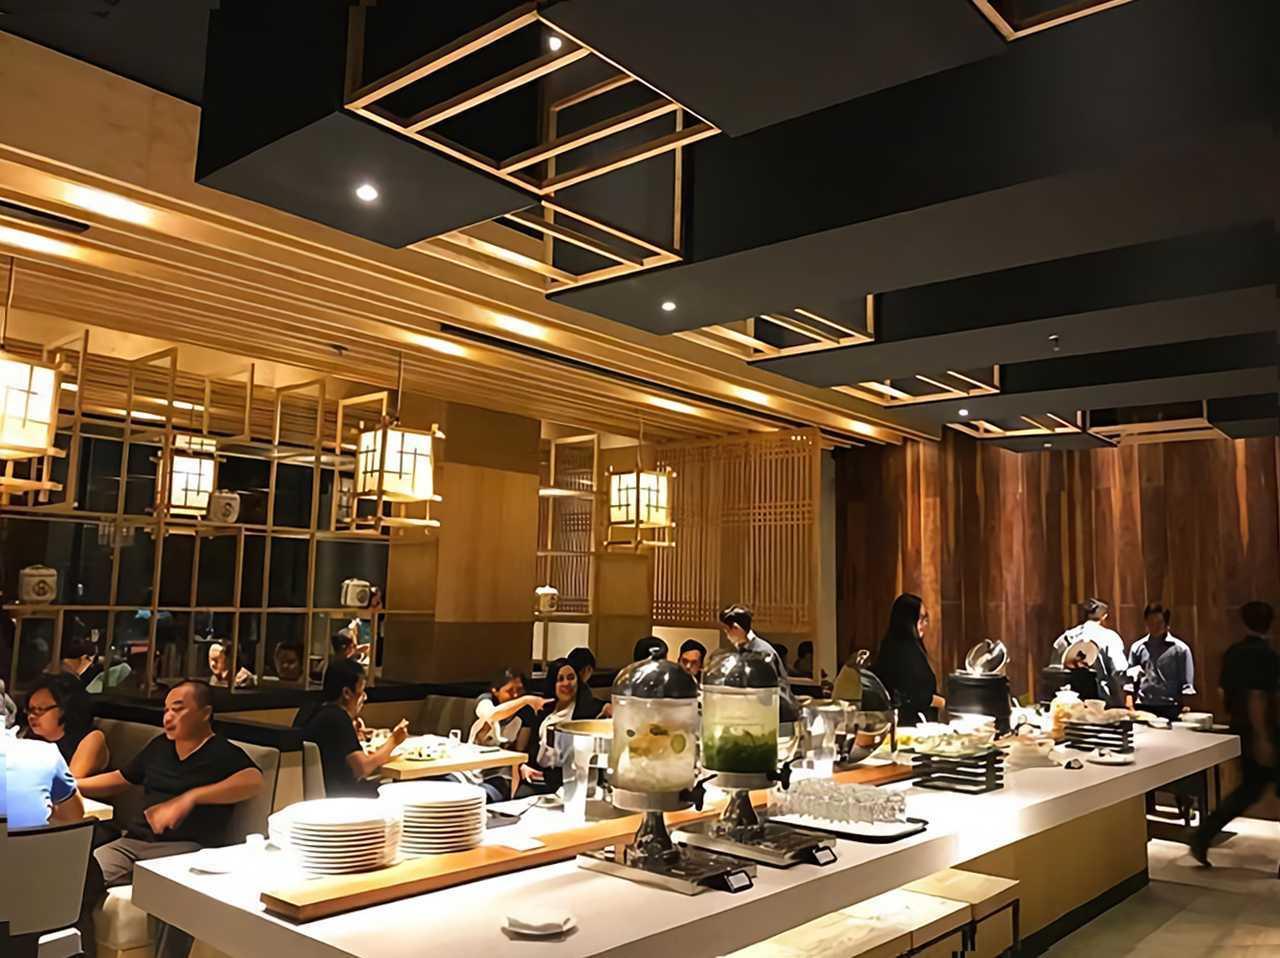 Pt Alradista Desain Indonesia Japanese Restaurant, Cikarang Cikarang, Bekasi, Jawa Barat, Indonesia Cikarang, Bekasi, Jawa Barat, Indonesia Dining Area   46561